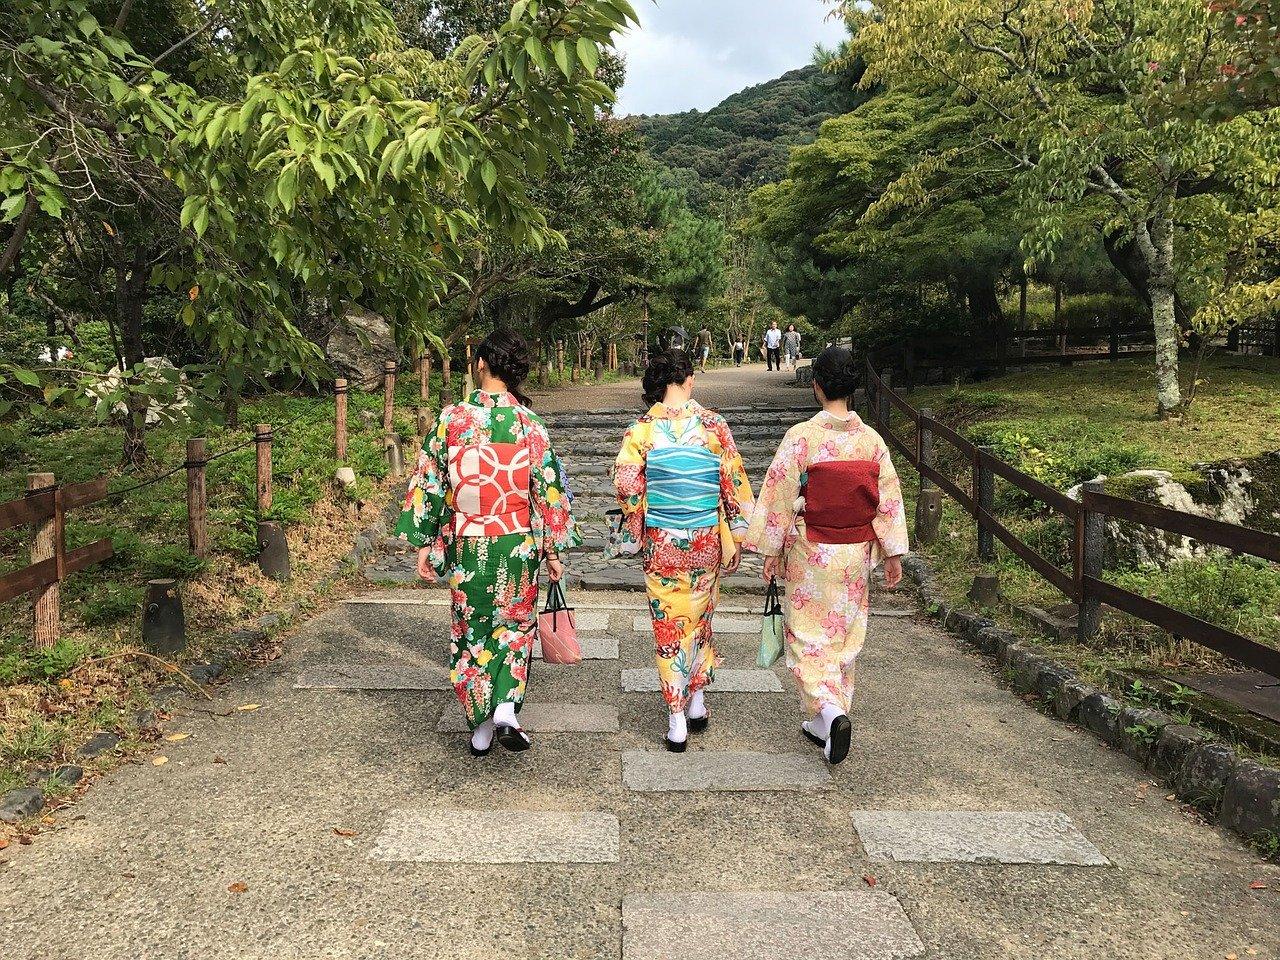 【関西】主な観光施設の営業再開・休業情報